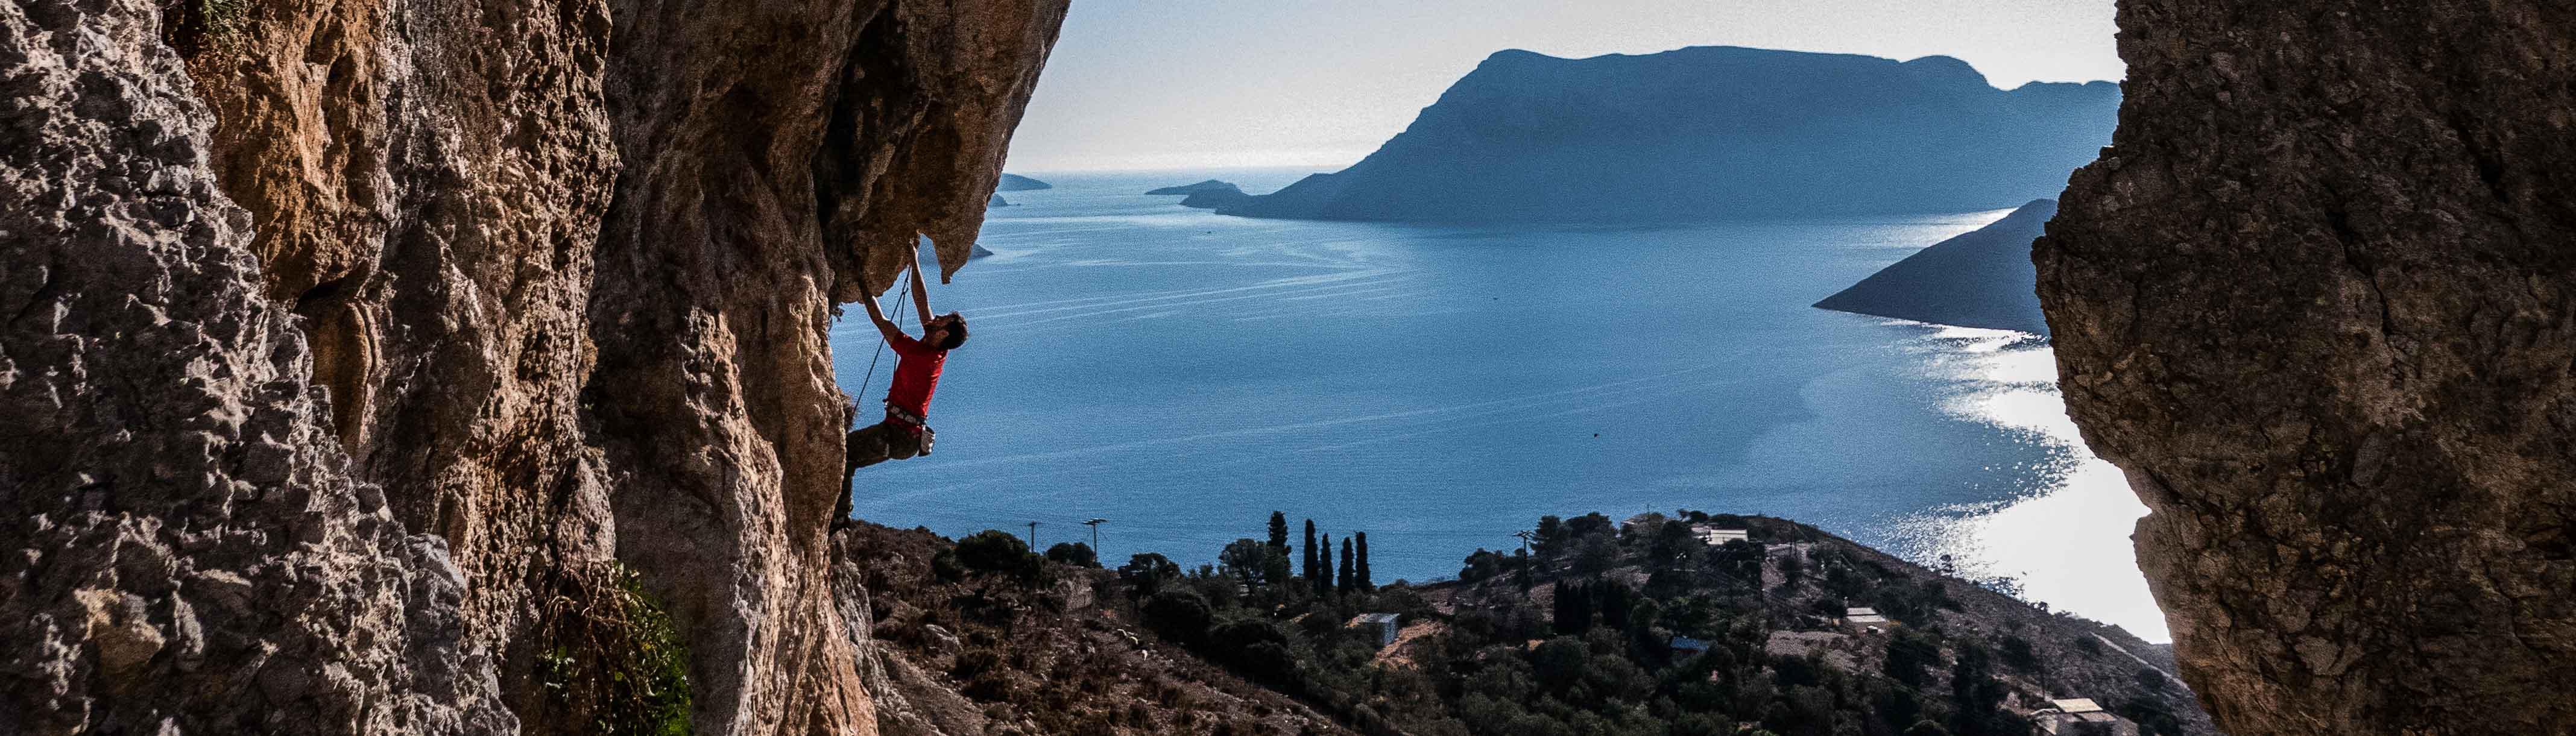 Klettern Leonidio